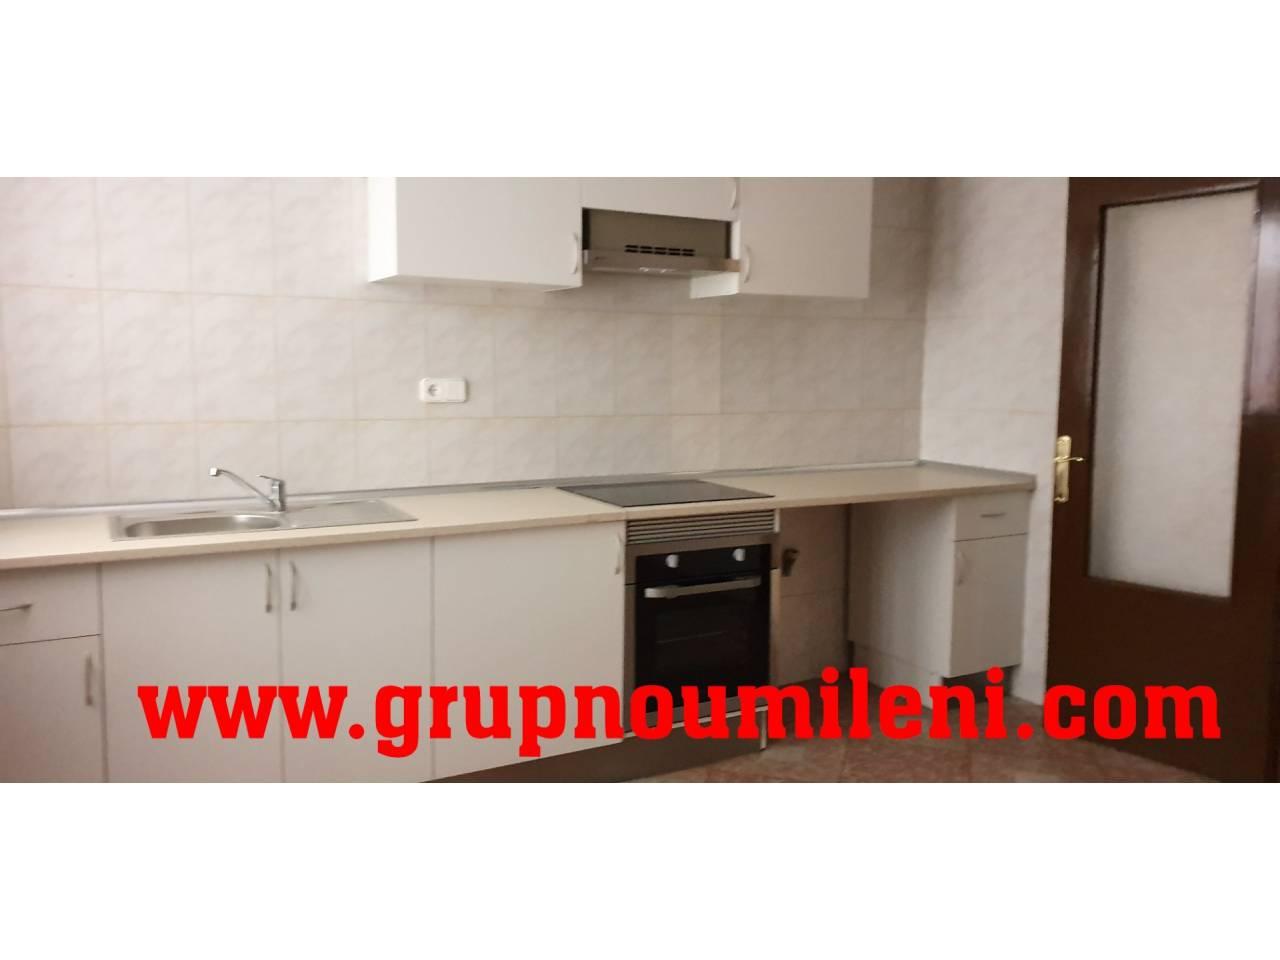 Alquiler Piso  Jutjats. Superf. 92 m²,  3 habitaciones (1 doble,  2 individuales),  1 ba